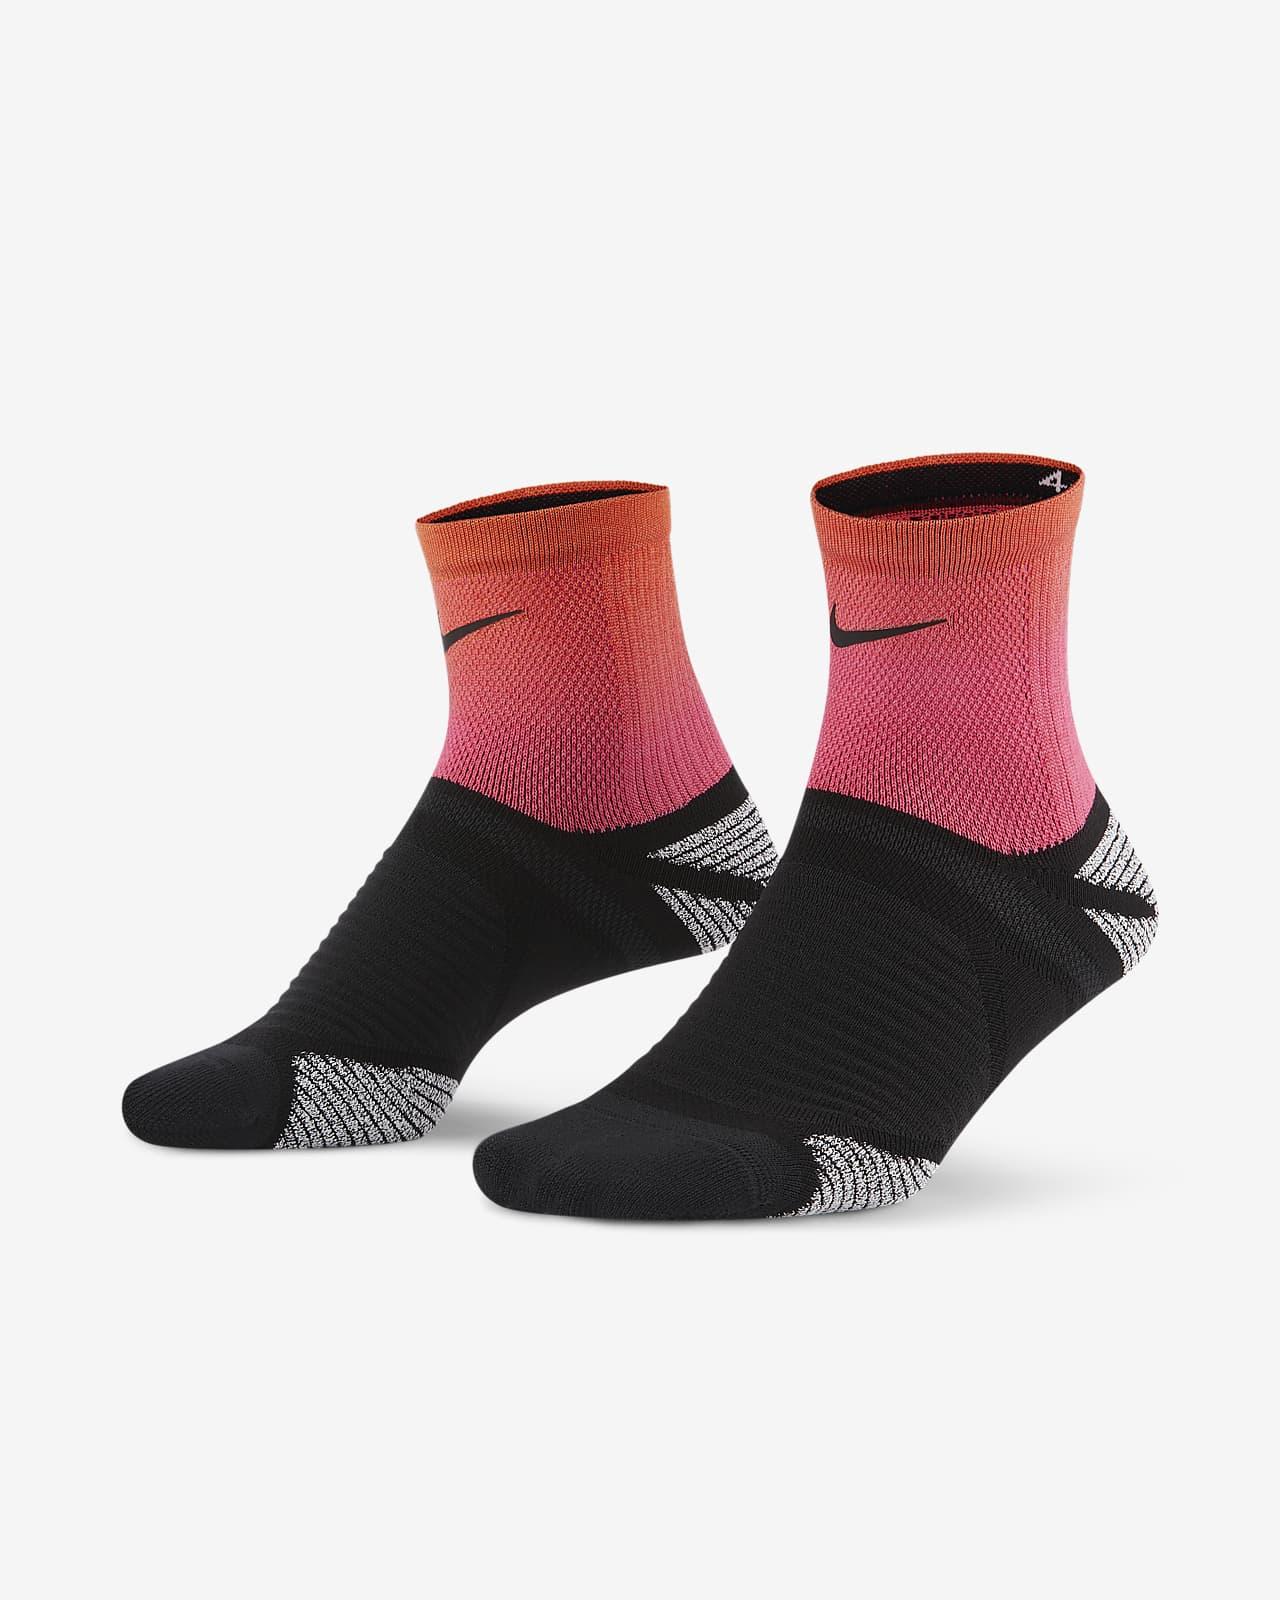 Skarpety startowe do kostki NikeGrip SOS